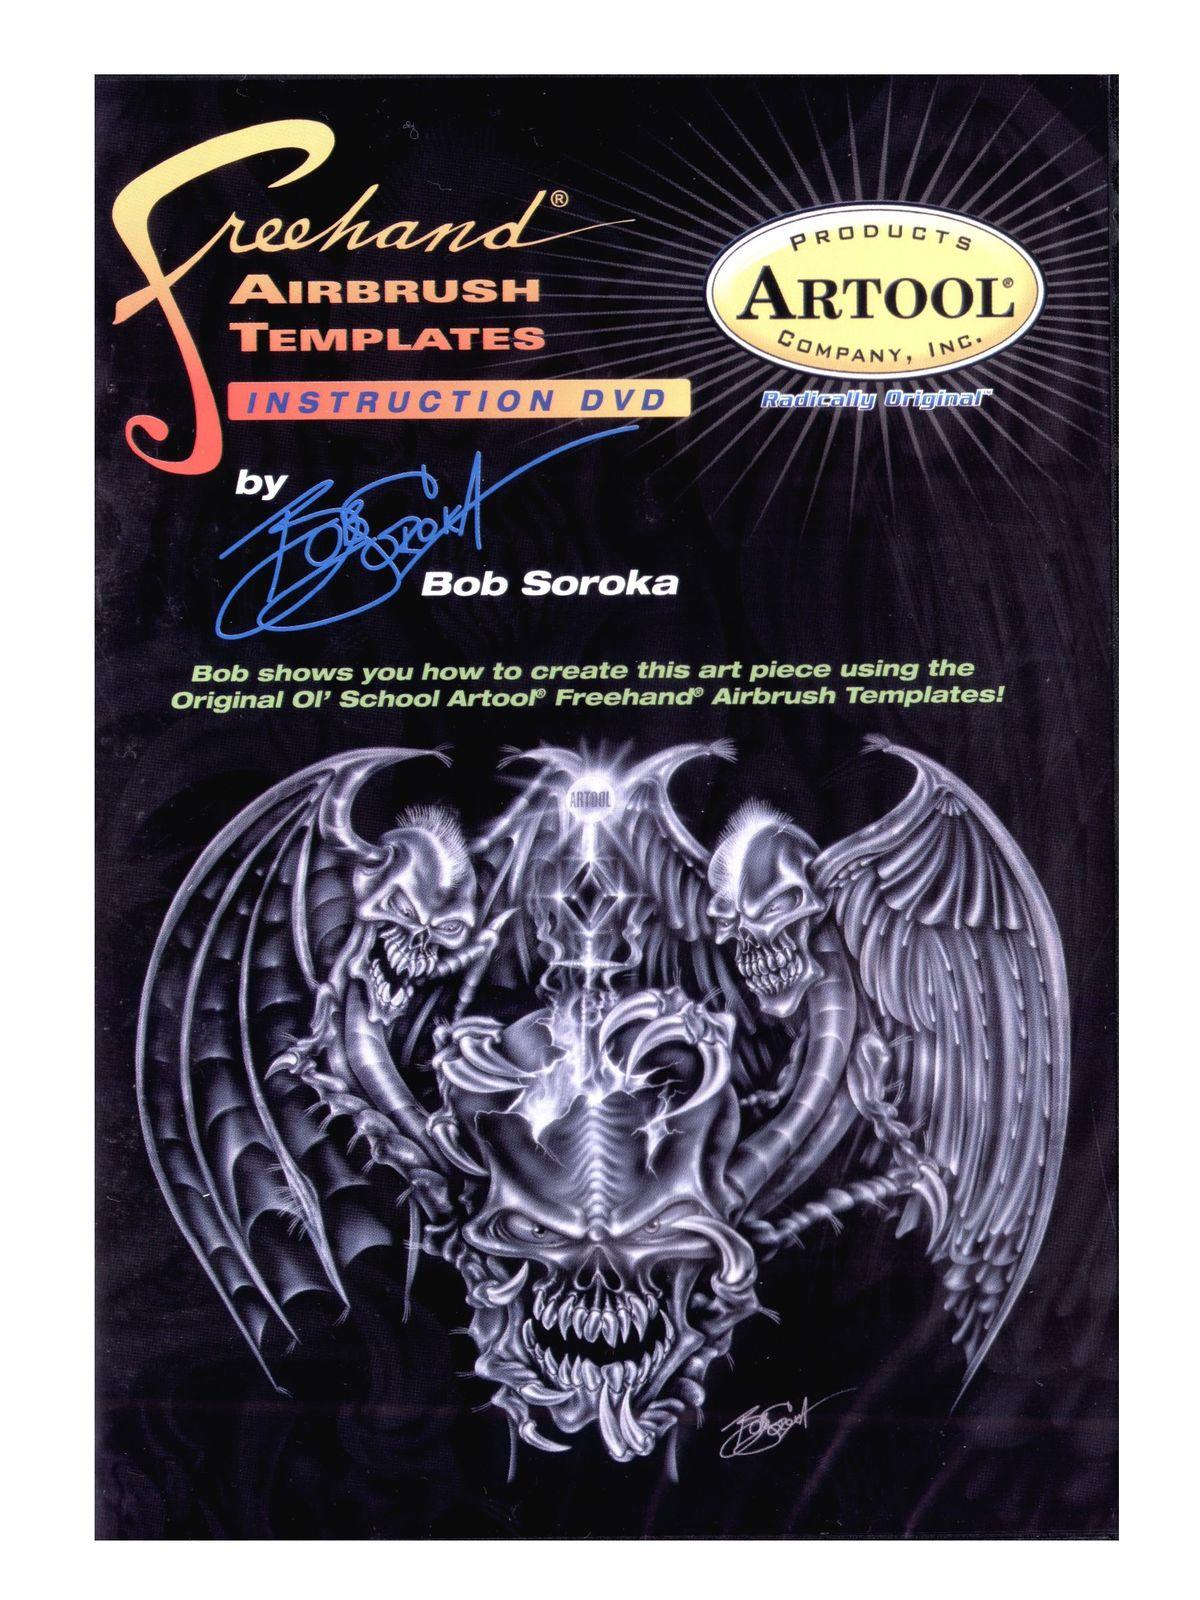 Freehand Airbrush Templates Instructional DVD by Bob Soroka